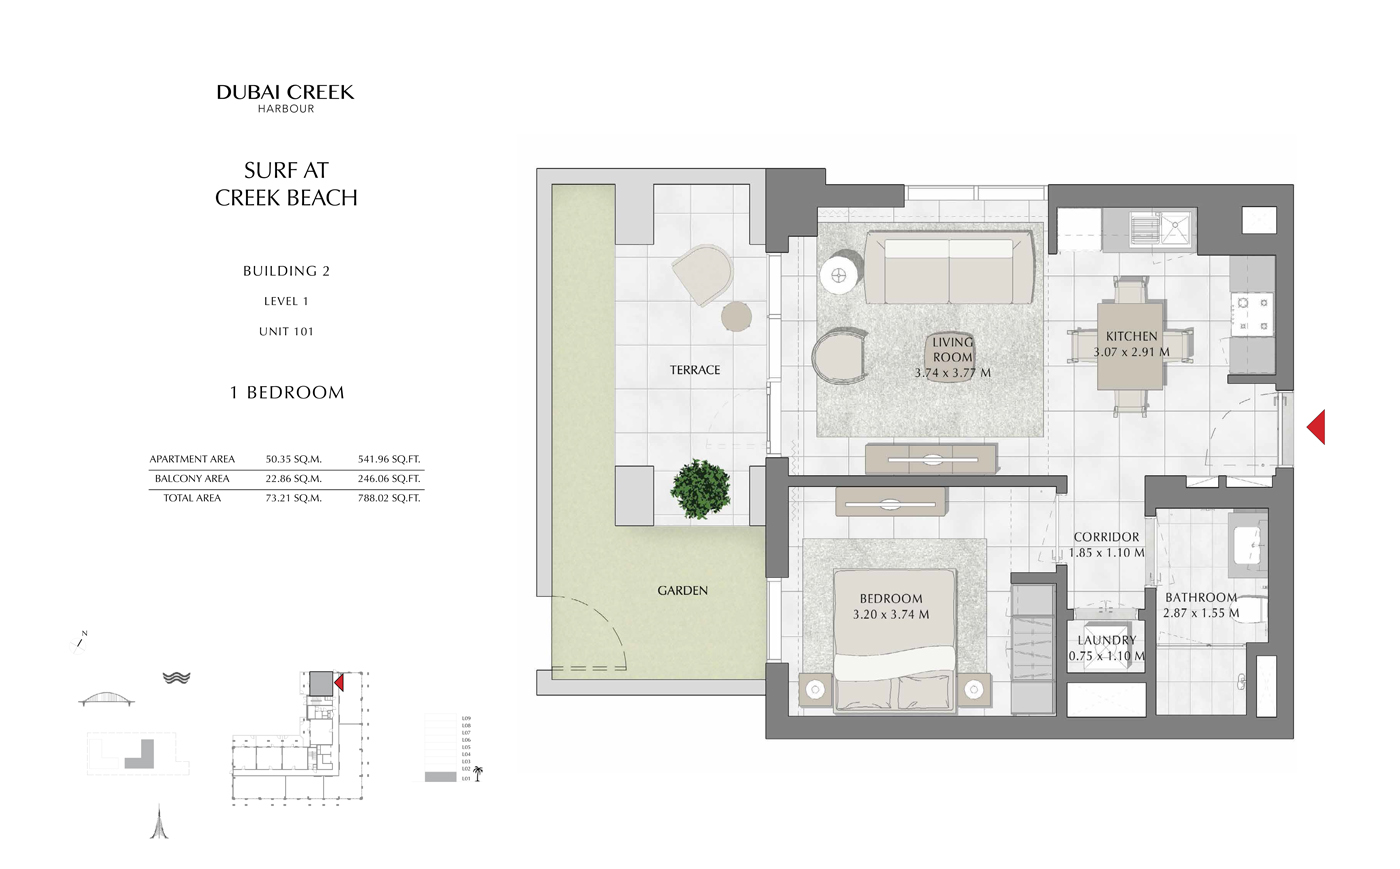 Building 2, 1 Bedroom Level 1, Unit 101, Size 788 Sq Ft